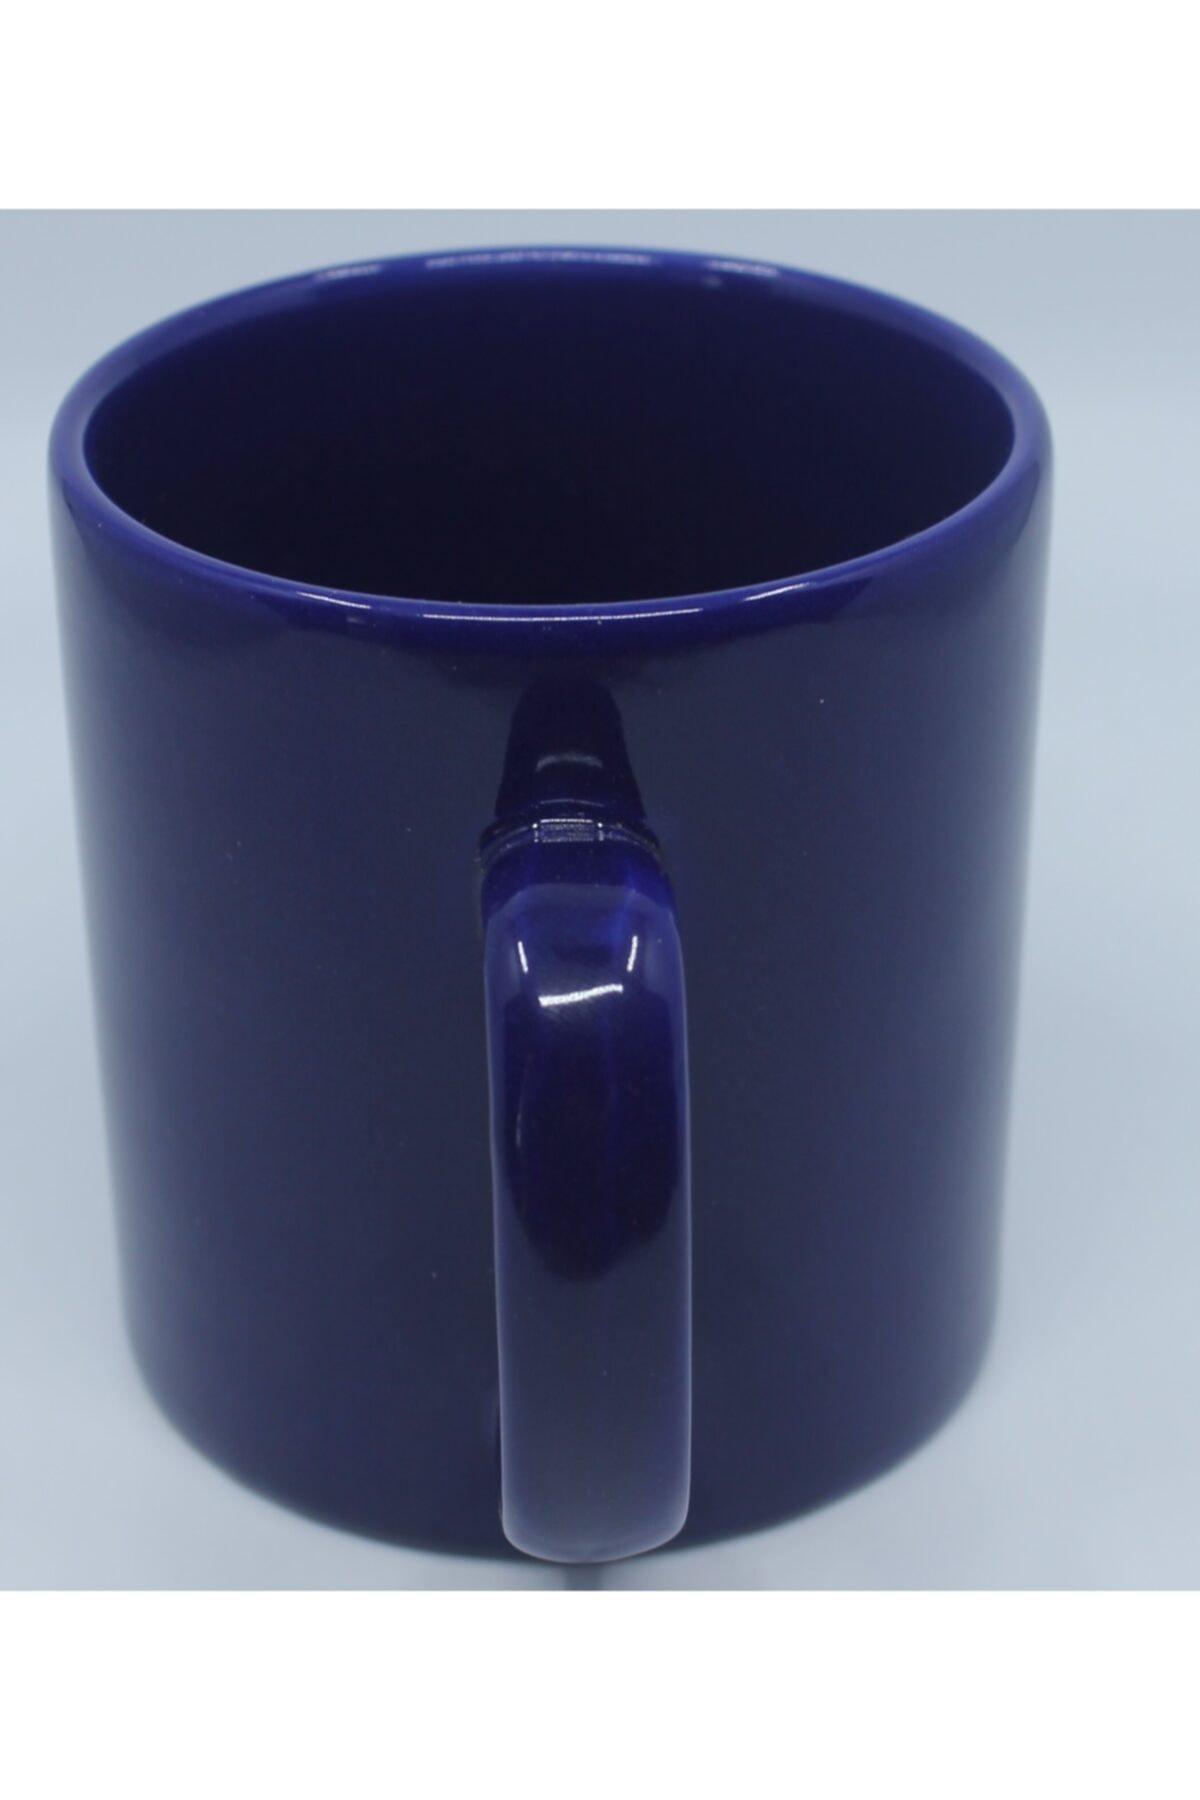 Keramika Silindirik Kupa Lacivert Tr200324fmx3a000000matv100 2